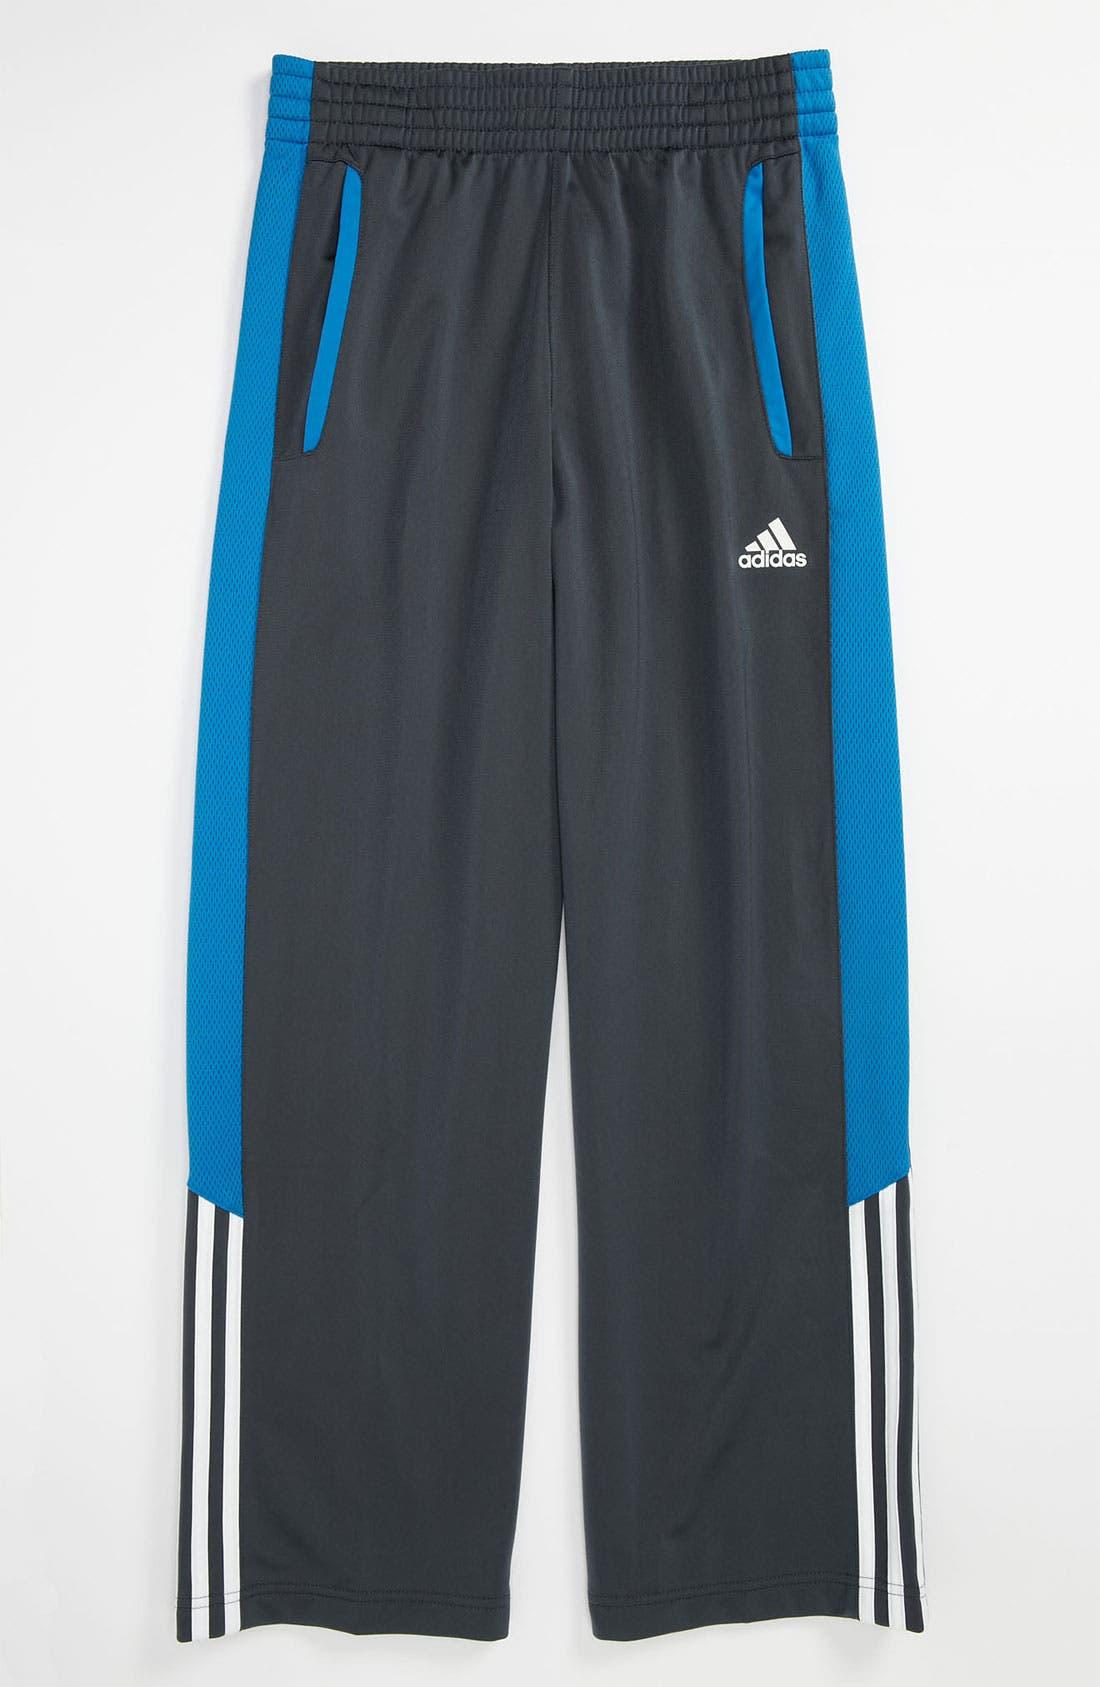 Alternate Image 1 Selected - adidas 'Pro Model' Pants (Big Boys)